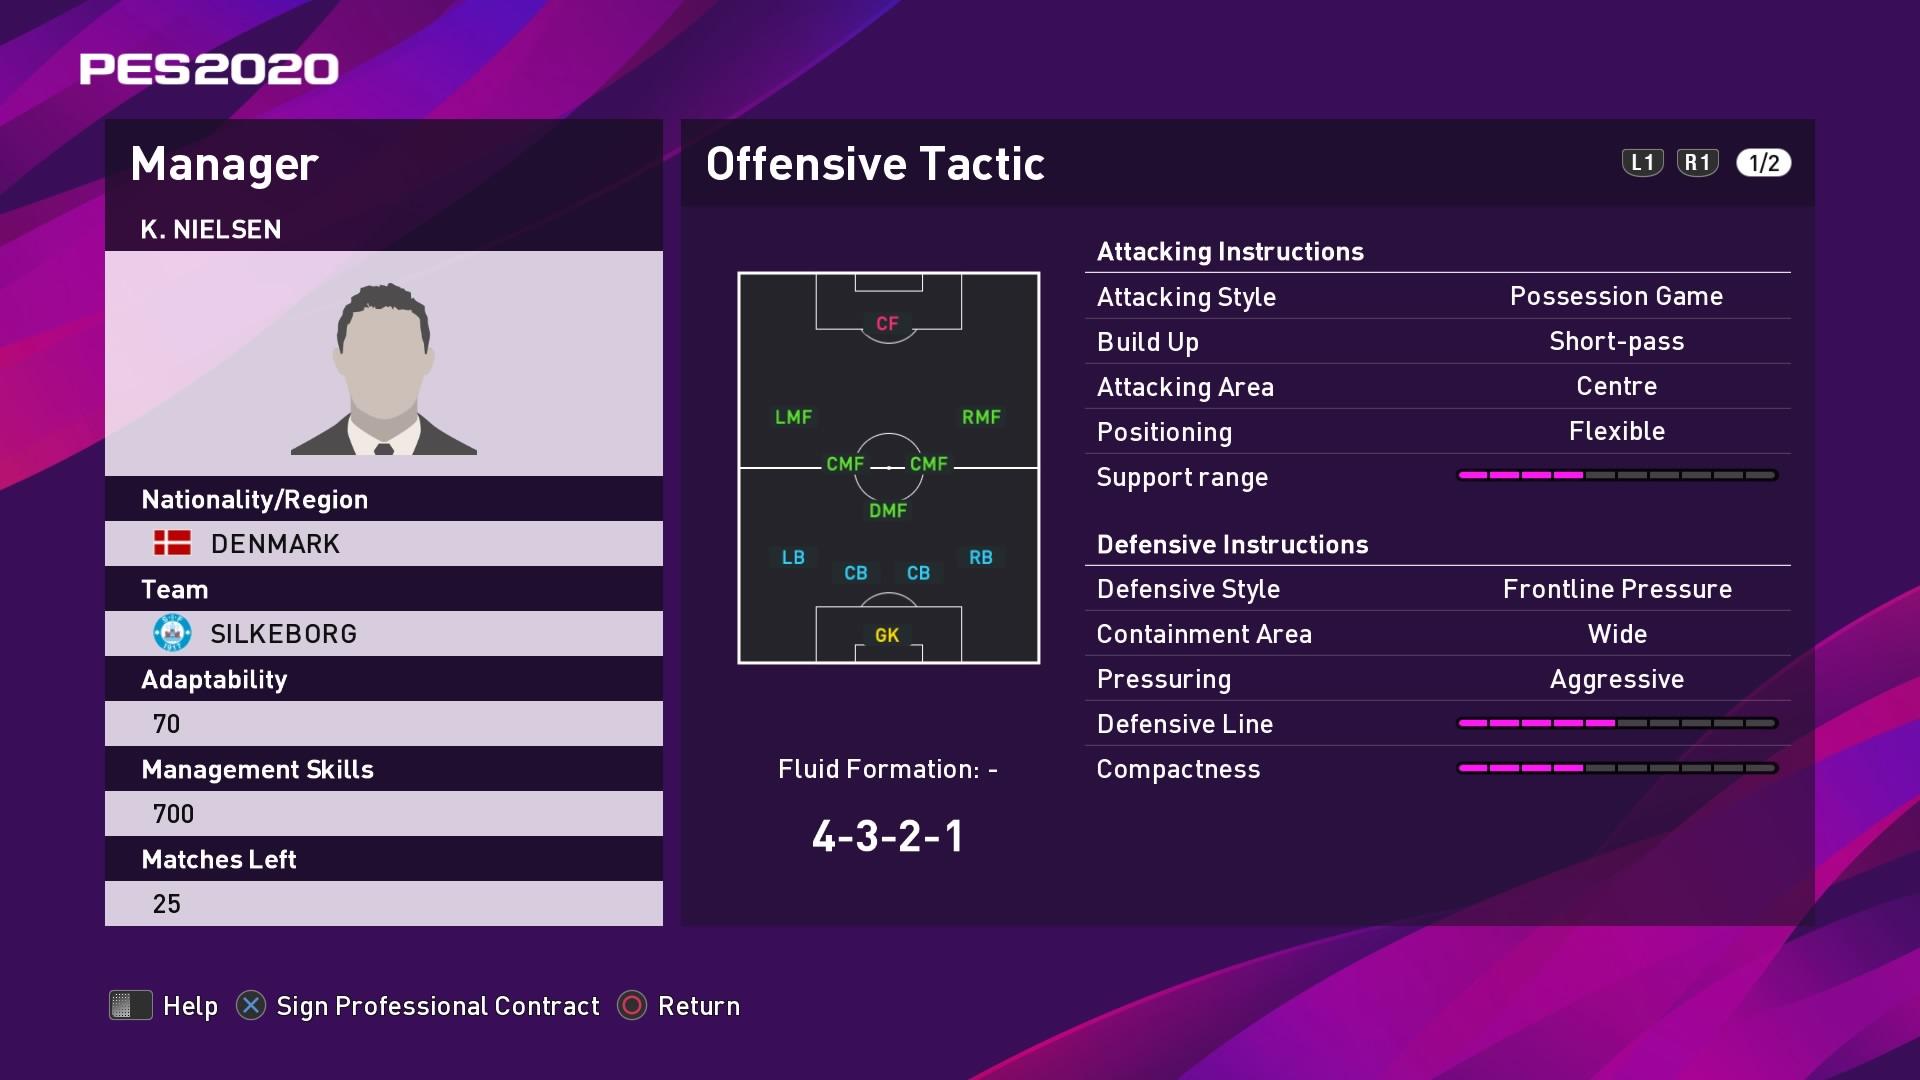 K. Nielsen (Kent Nielsen) Offensive Tactic in PES 2020 myClub